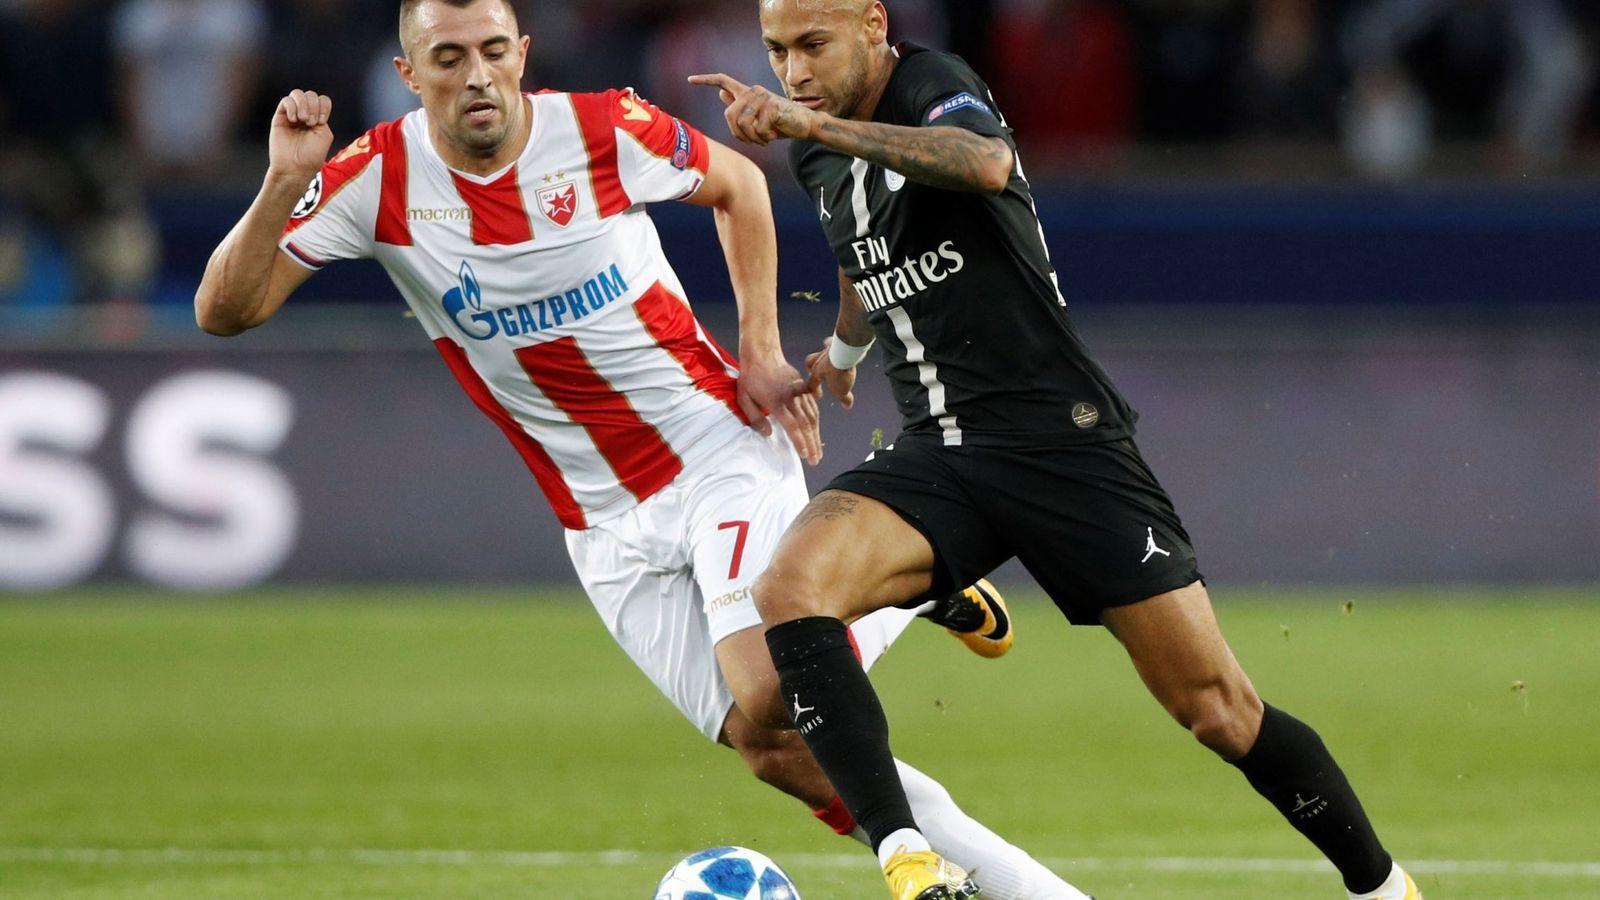 Francia investiga un posible amaño en el PSG-Estrella Roja de Champions League